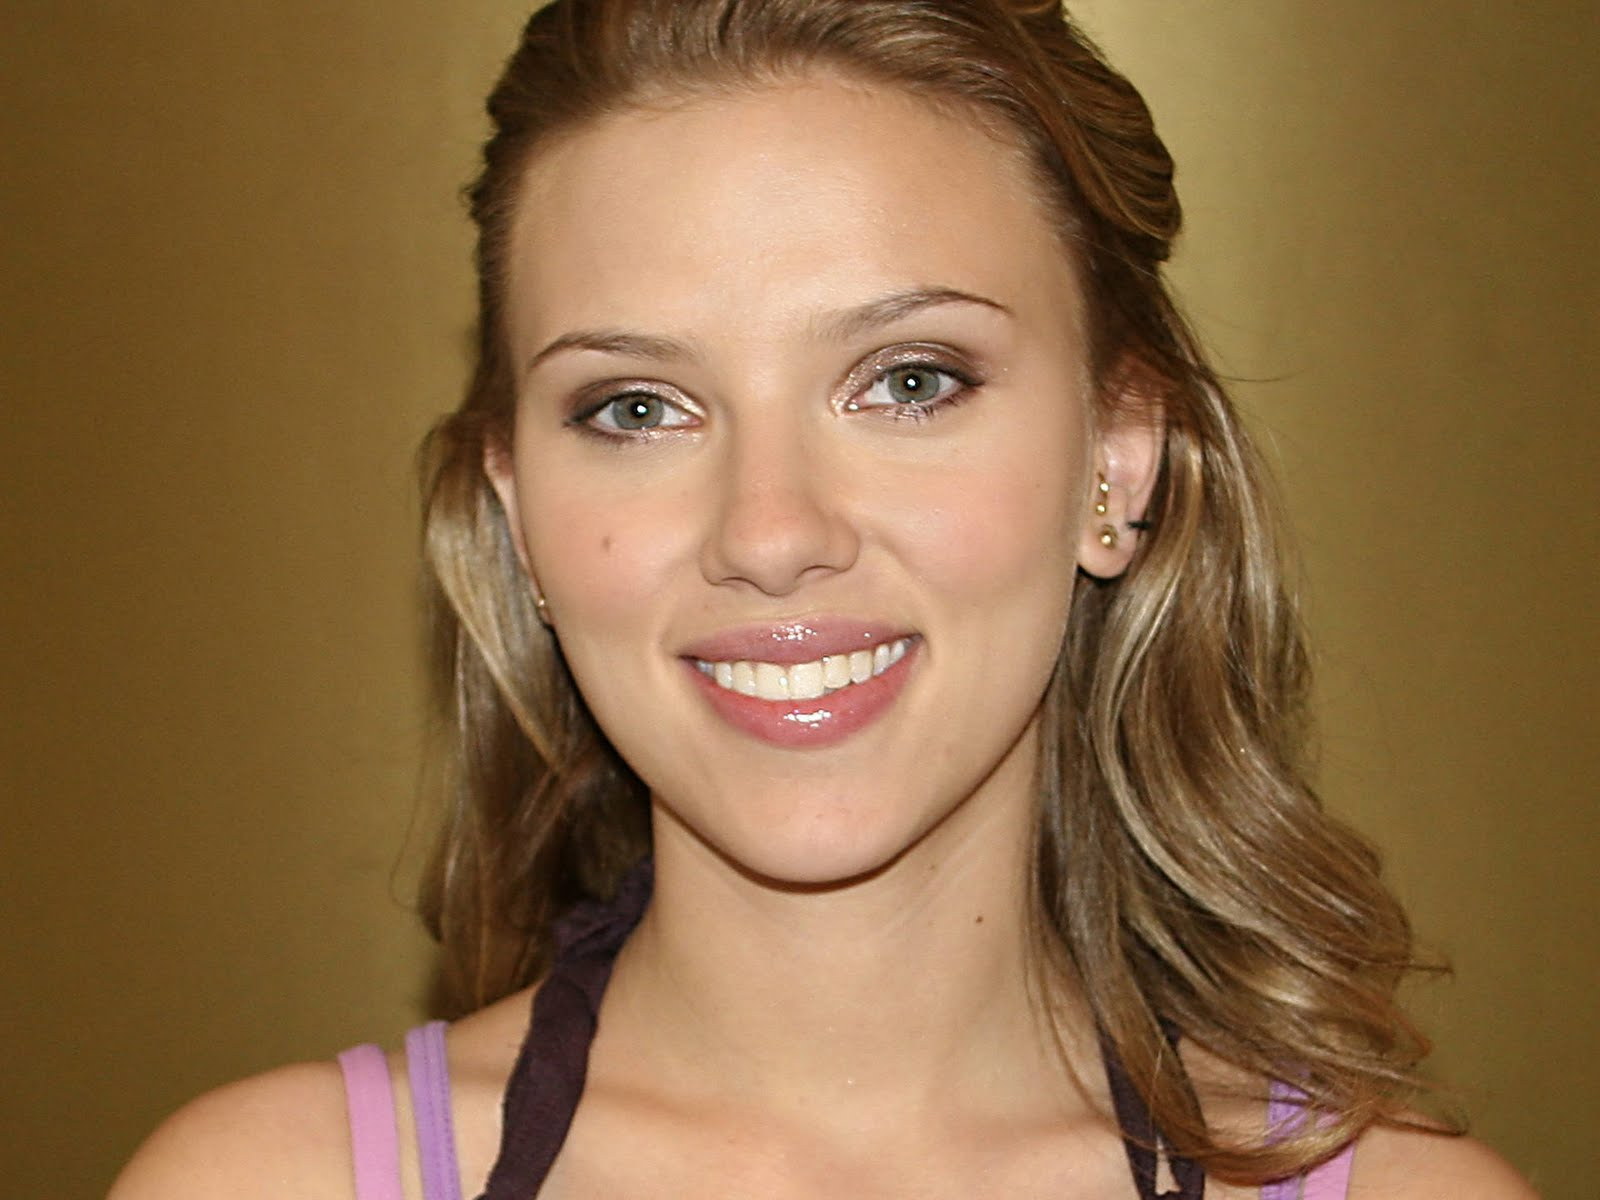 Scarlett Johansson Romance Hairstyles Gallery, Long Hairstyle 2013, Hairstyle 2013, New Long Hairstyle 2013, Celebrity Long Romance Hairstyles 2071